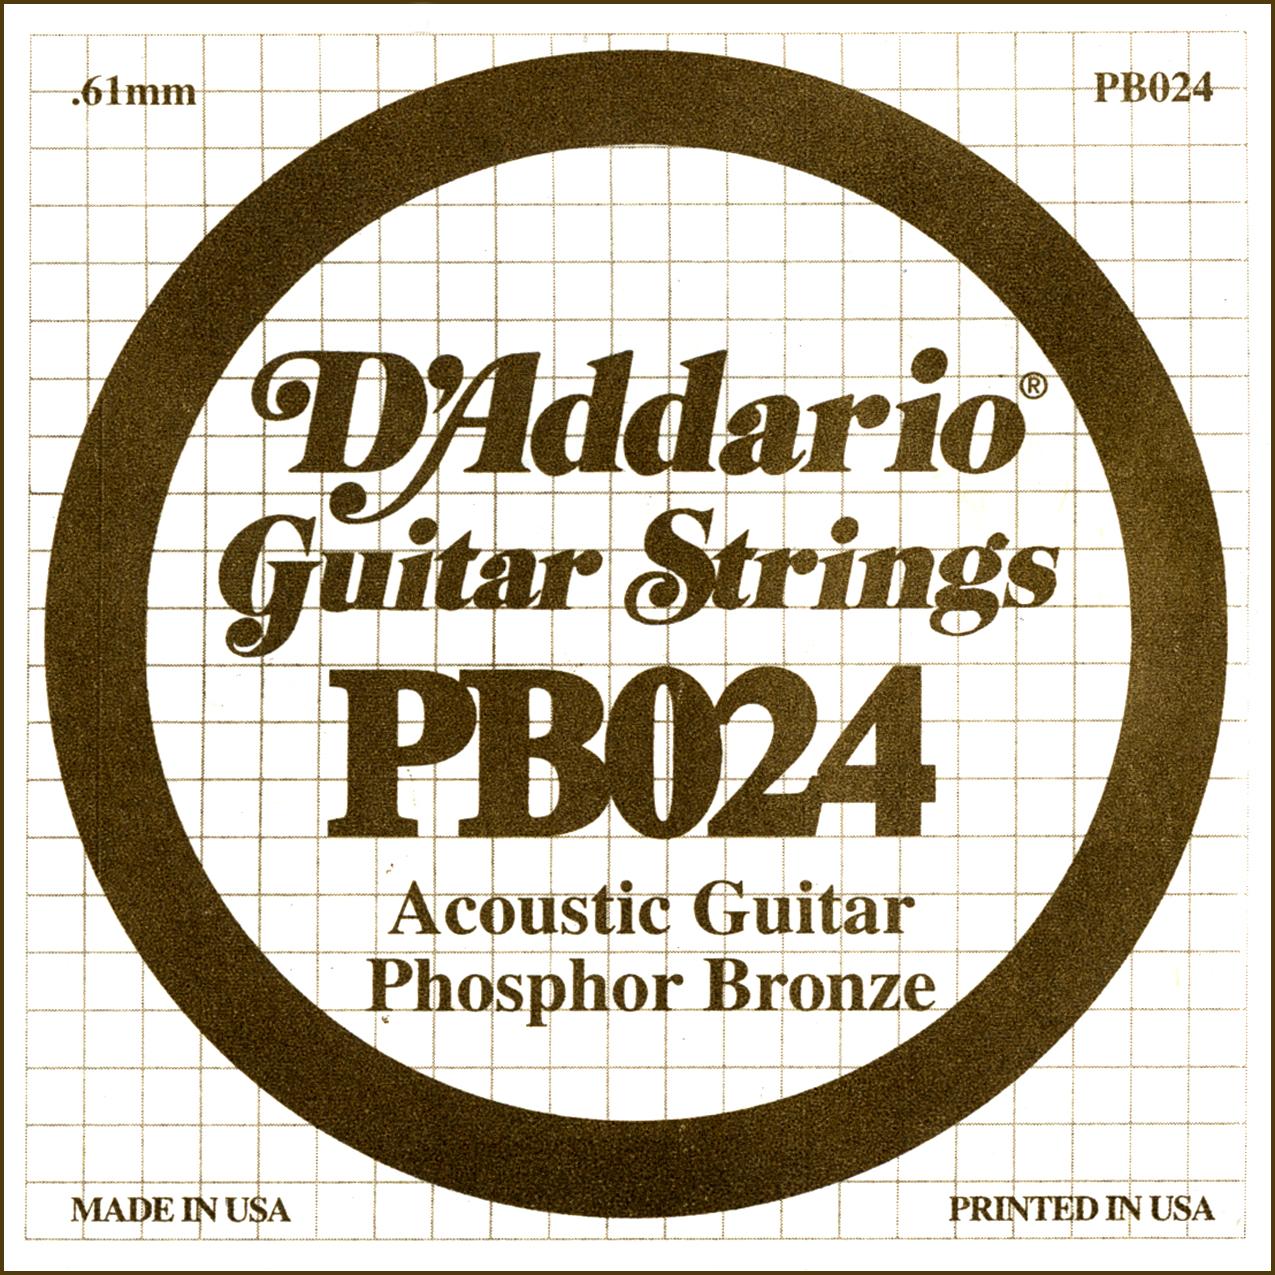 D'Addario Single Strings PBO24